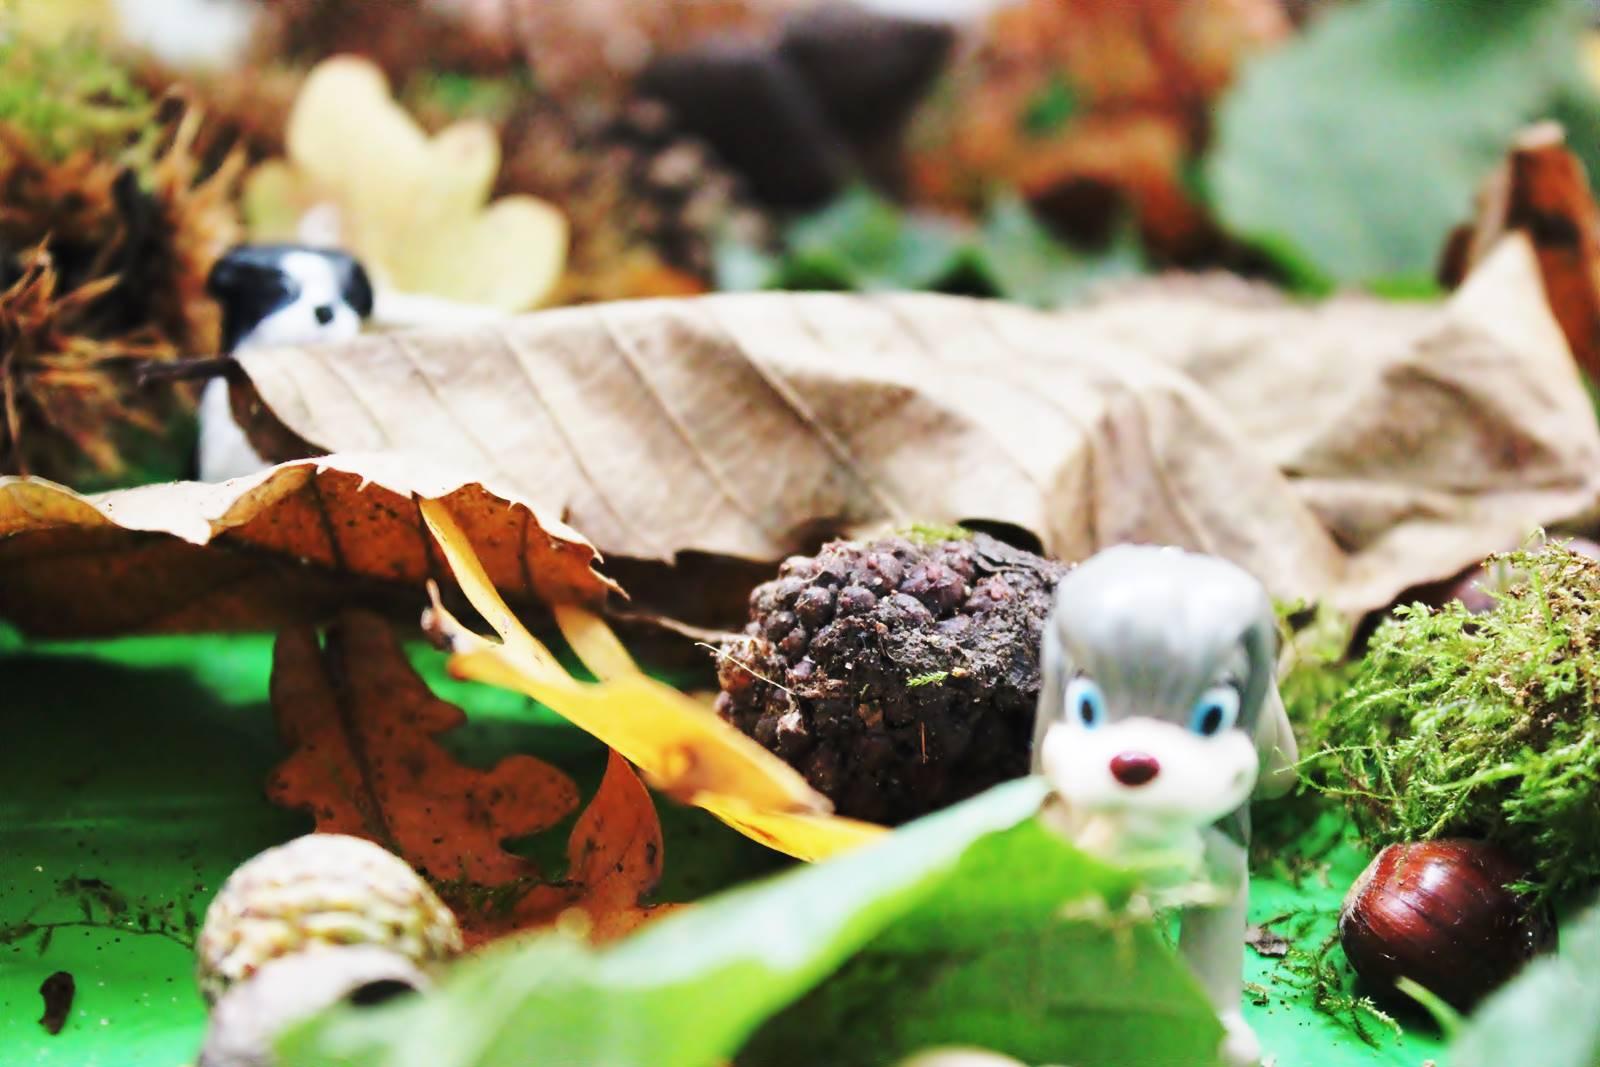 Table des saisons steiner waldorf ief homescooling ecole maison automne 2